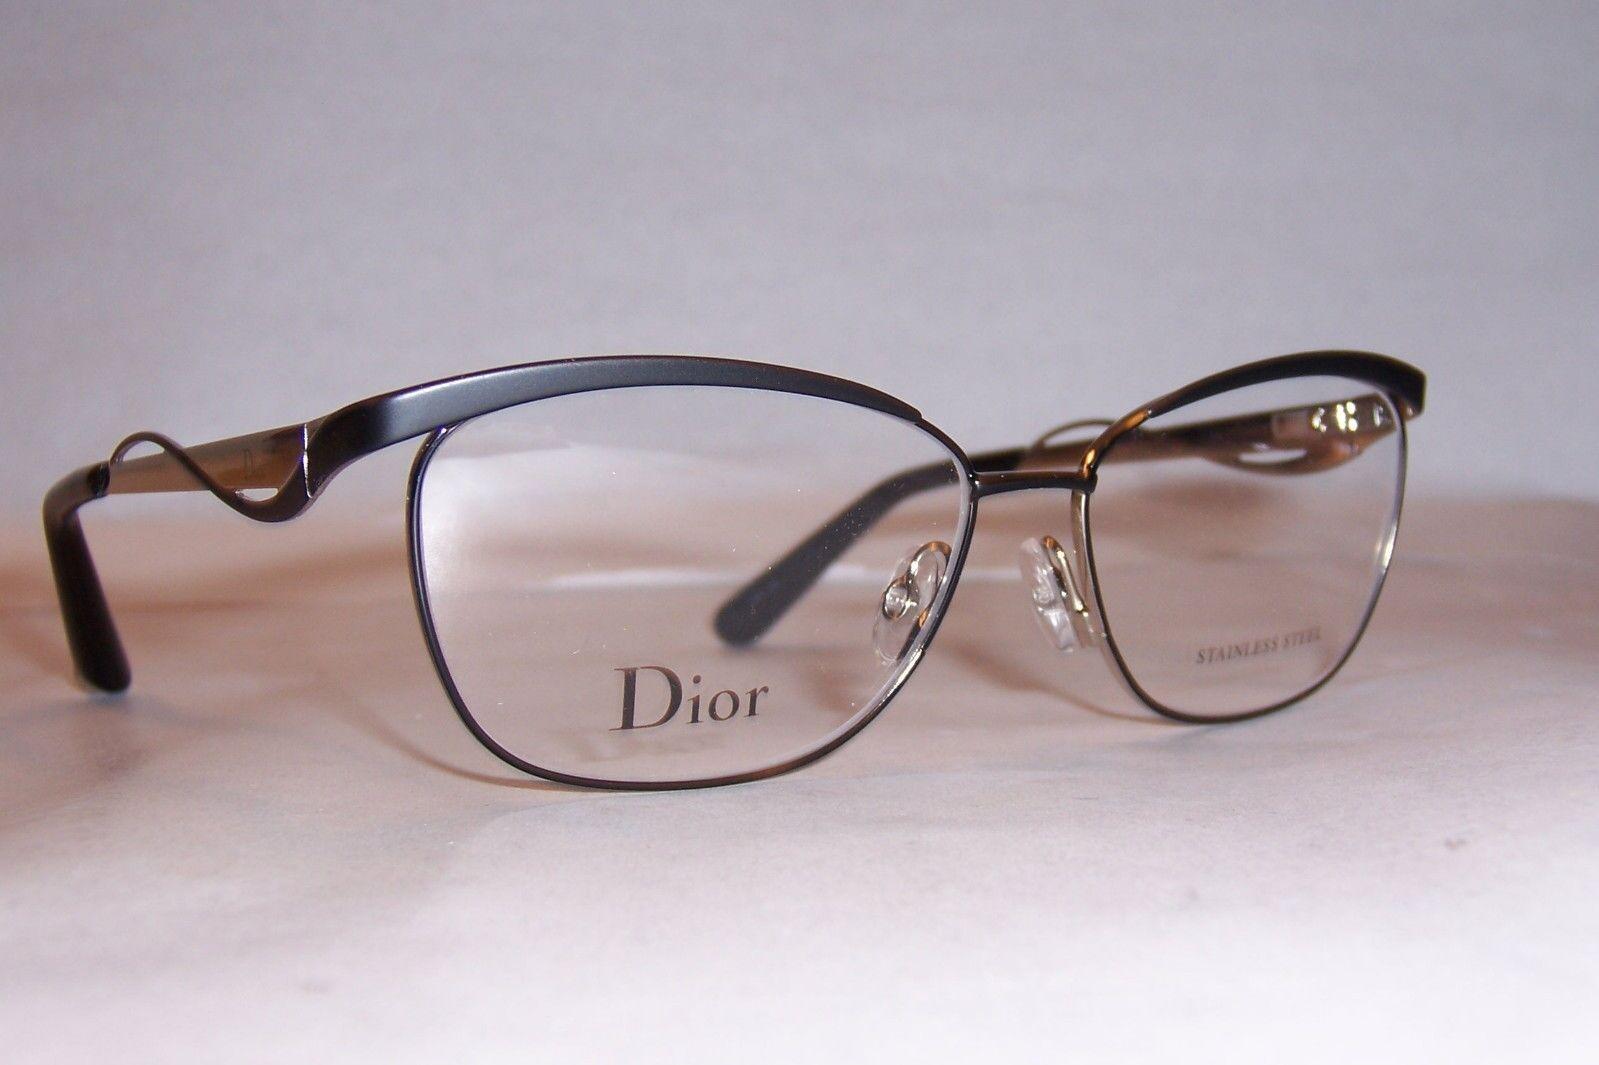 2488f1cc33 Christian Dior Eyeglasses CD 3783 G8q Black 55mm RX Authentic for ...